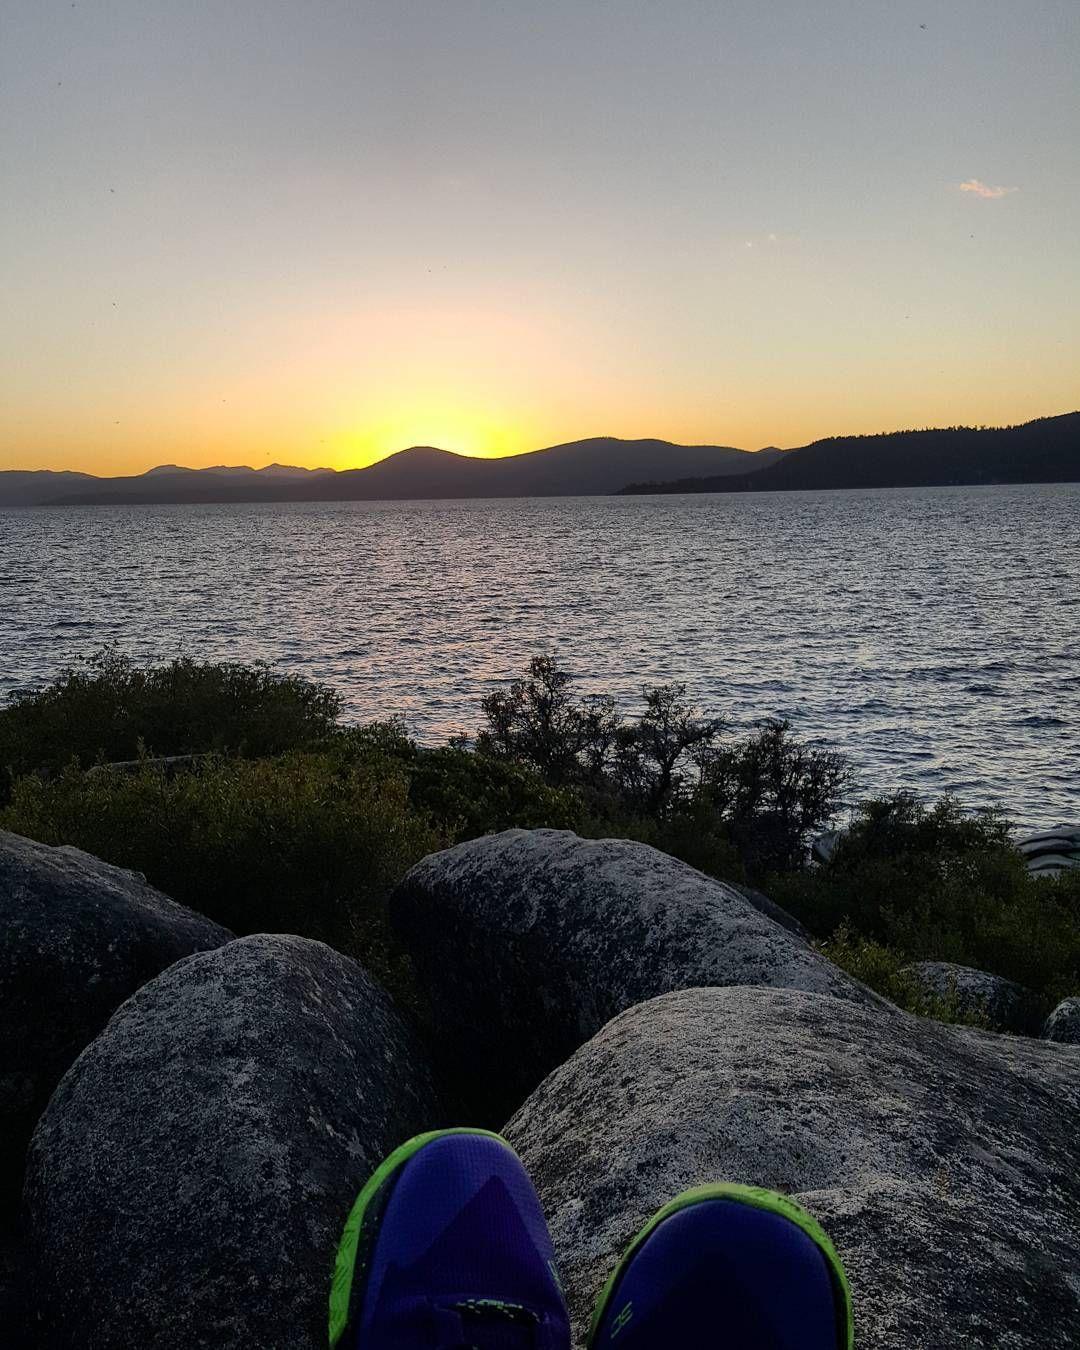 Sunset watching on Lake Tahoe. Hope you guys had a great Wednesday!  #suckitupfitness #sunset #laketahoe